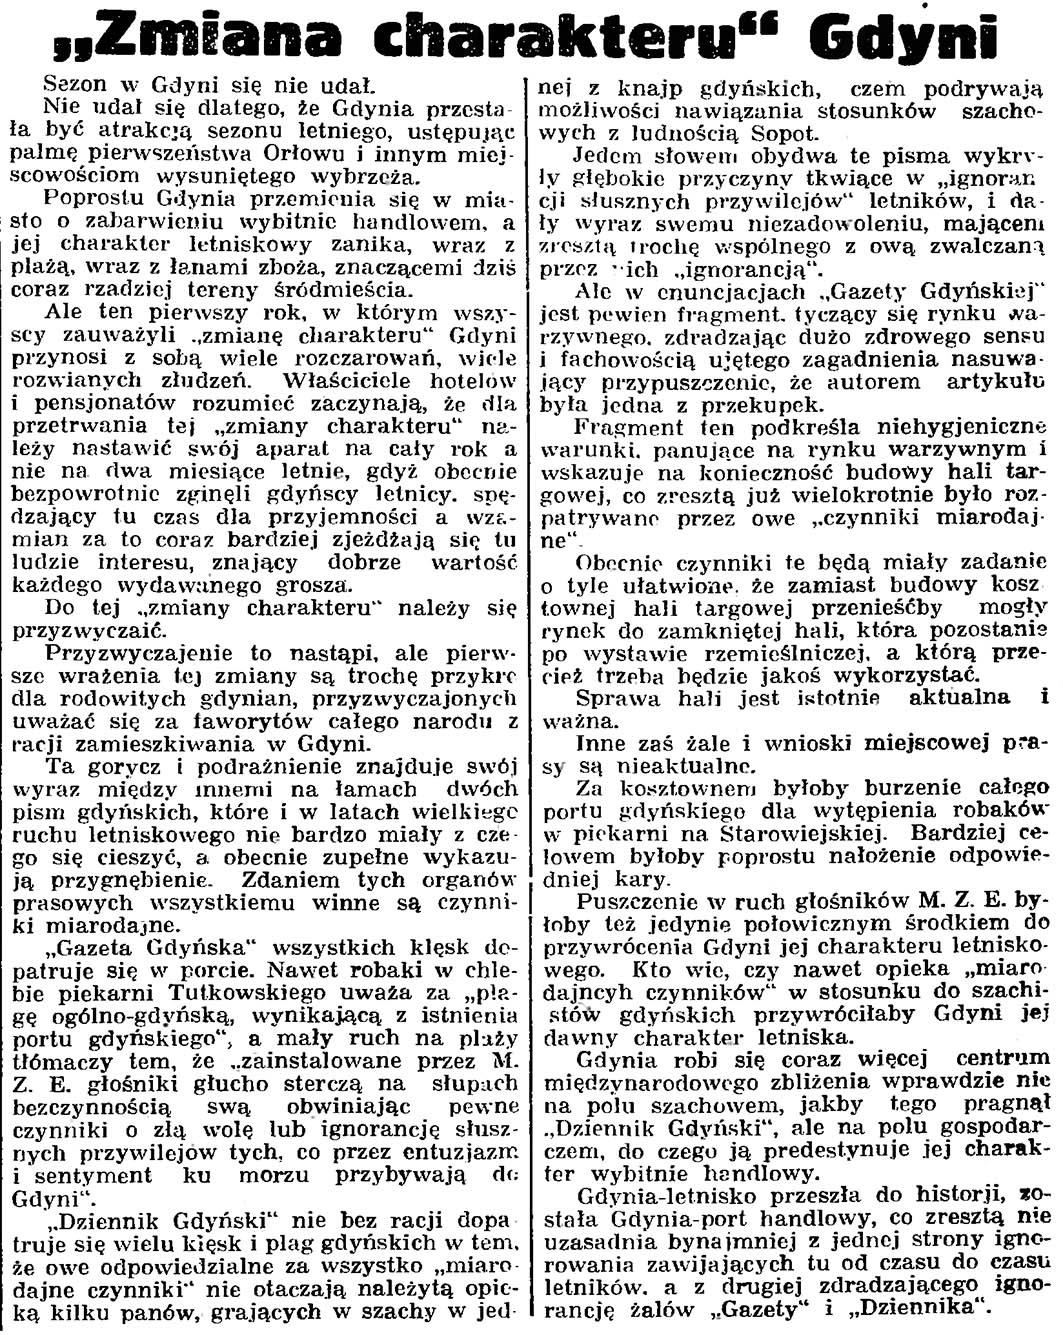 """Zmiana charakteru"" Gdyni // Gazeta Gdańska. - 1935, nr 172, s. 8"